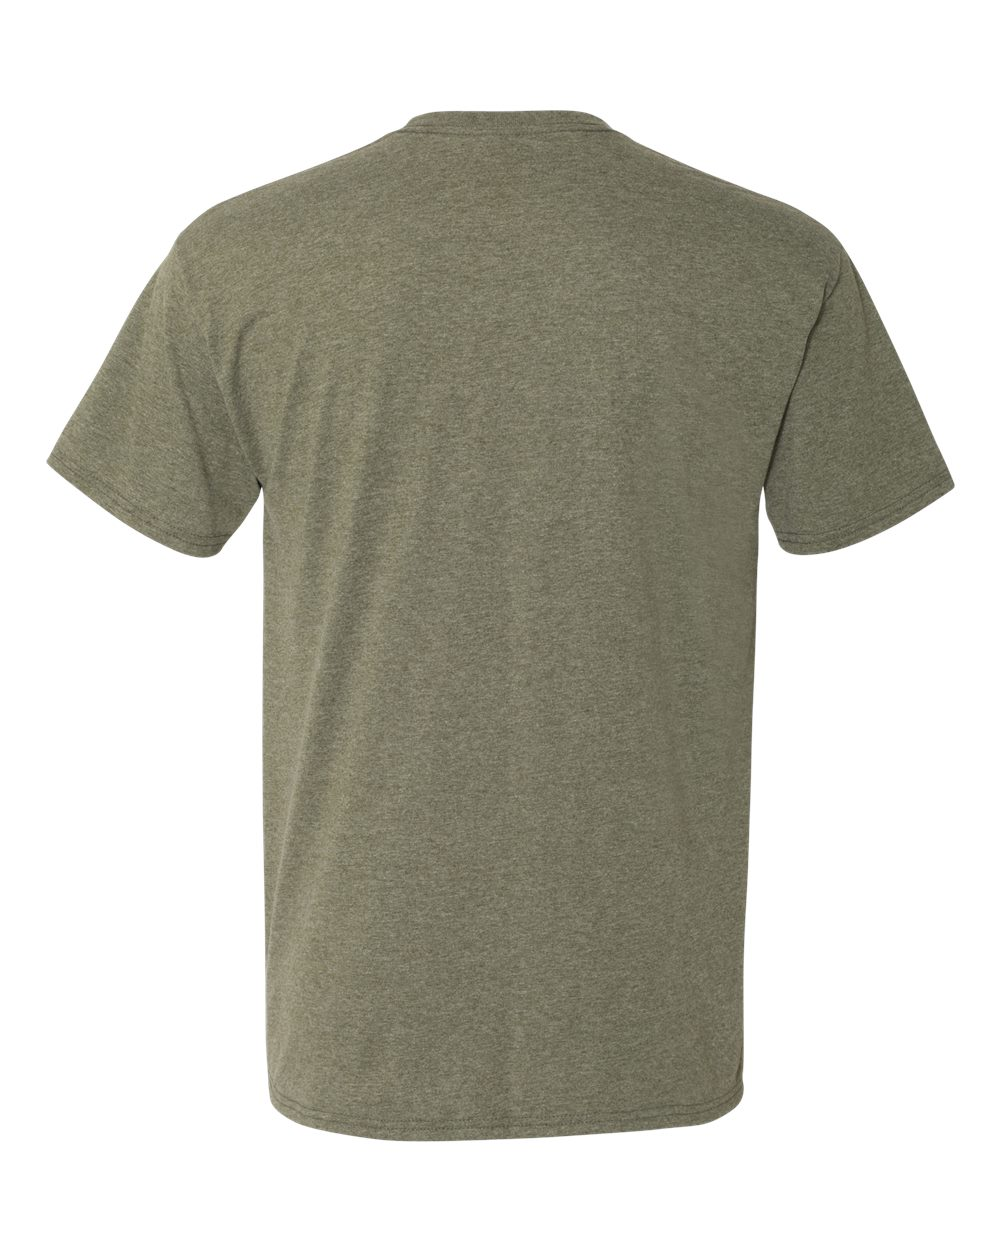 Hanes-Men-039-s-X-Temp-Triblend-T-Shirt-With-Fresh-Iq-42TB-S-3XL thumbnail 18